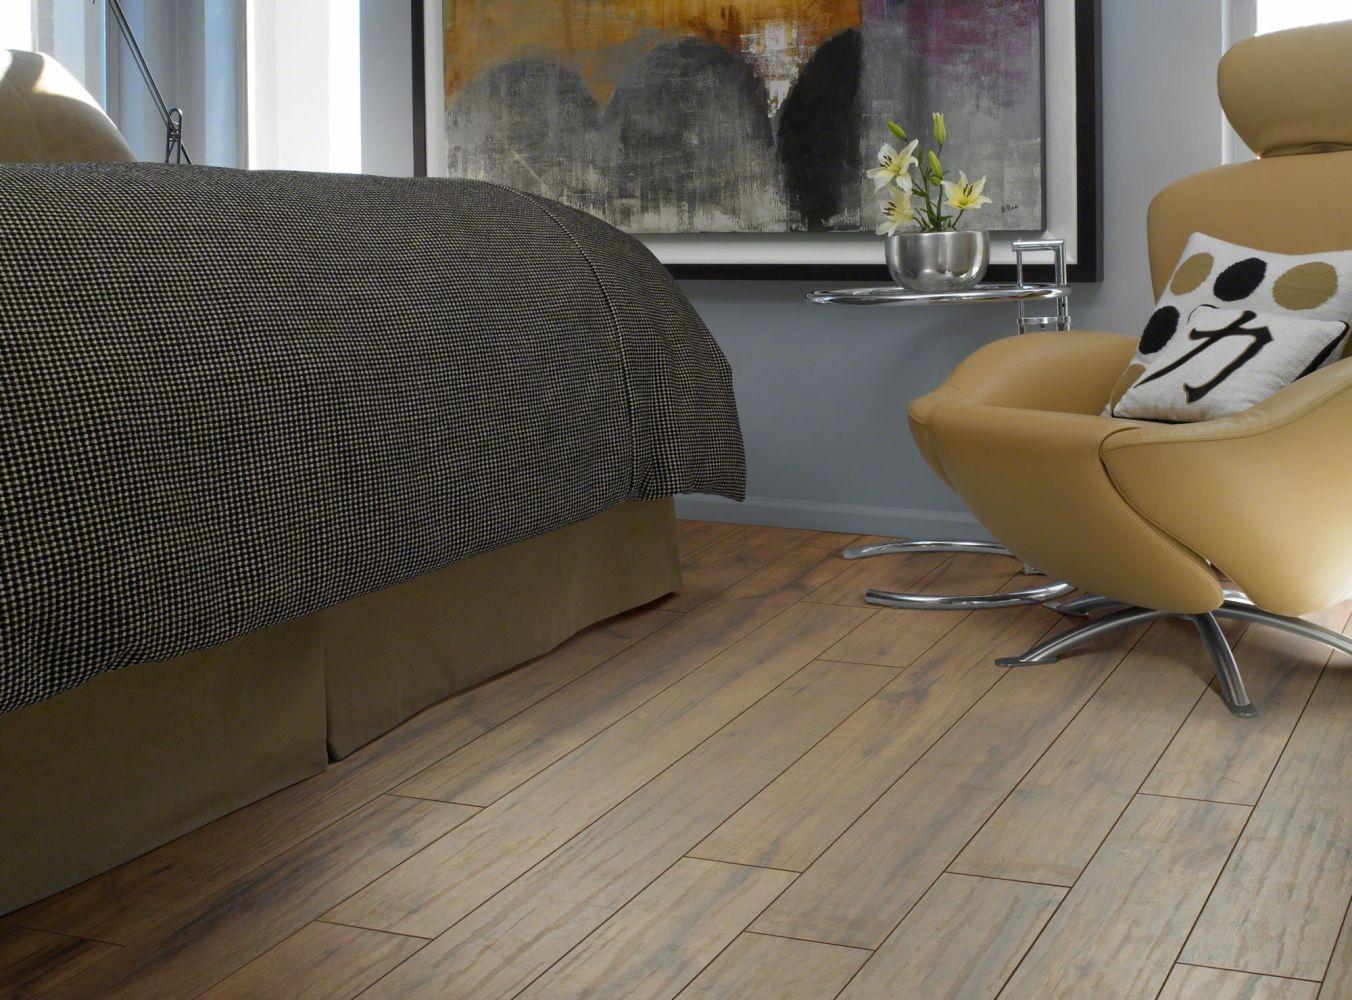 Shaw Floors Versalock Laminate Timberline Corduroy Rd Hckry 00426_GT012